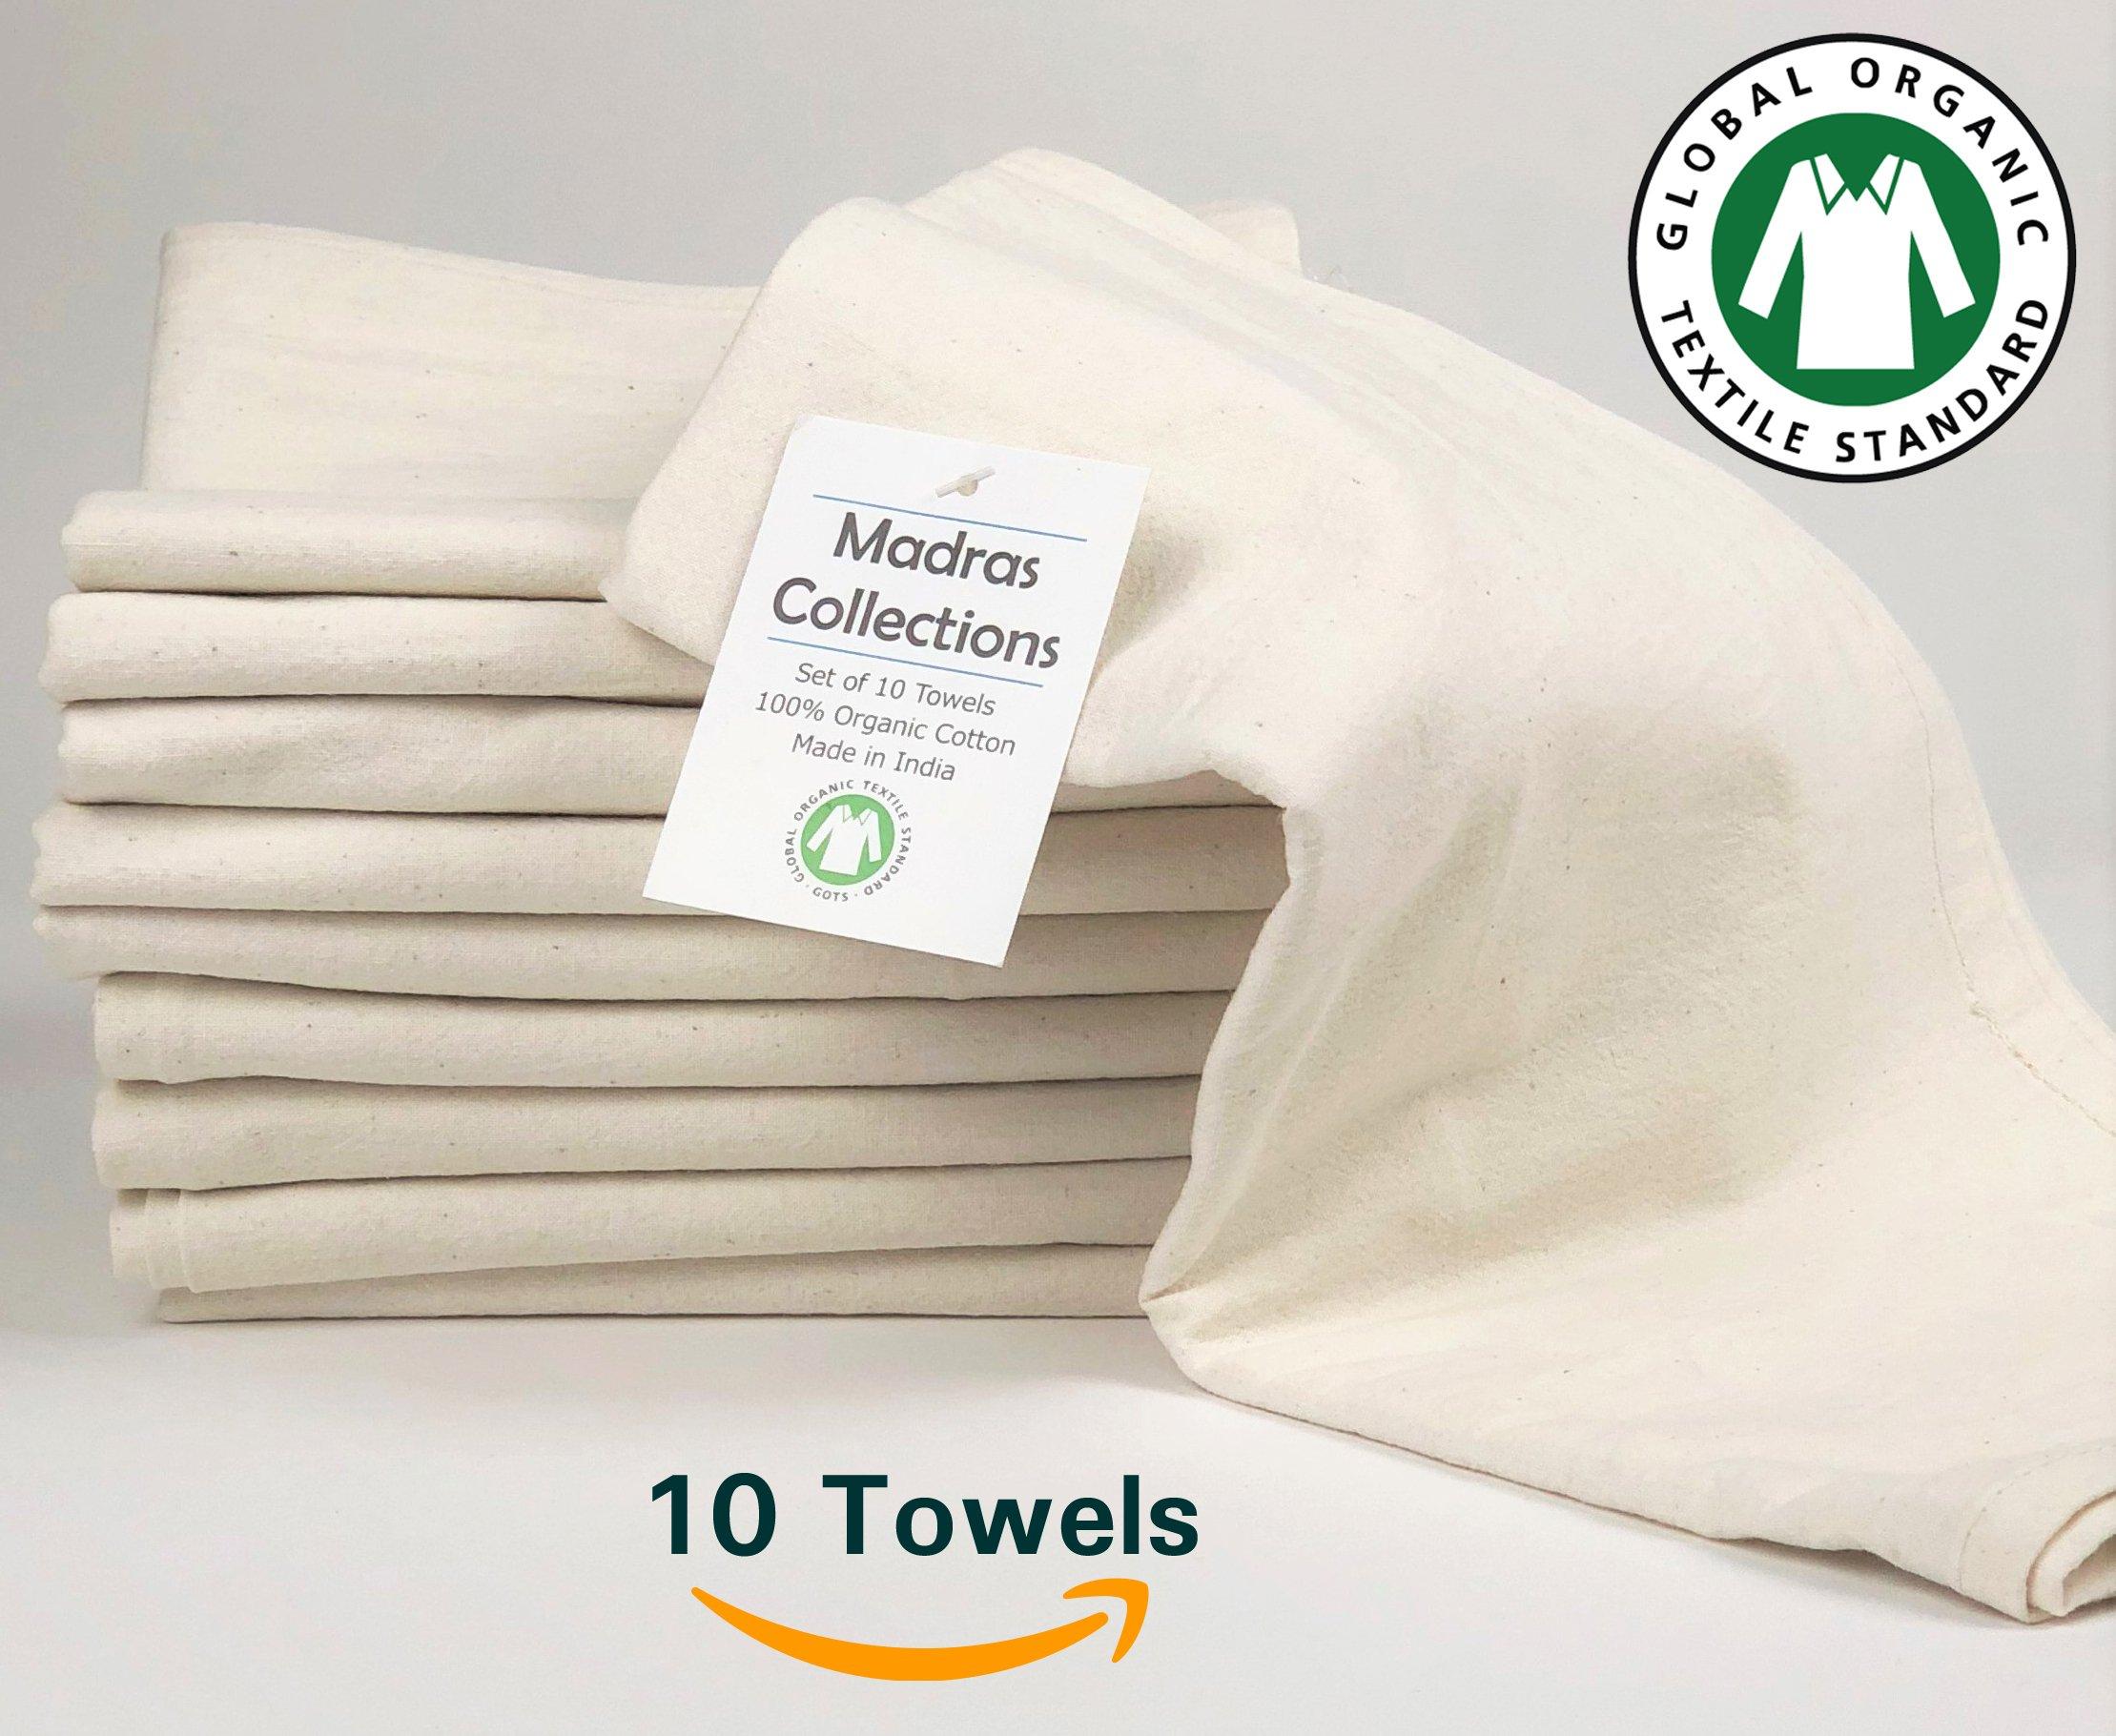 Madras Collections ORGANIC cotton Kitchen Vintage Flour Sack Kitchen Dish Towel, Commercial Restaurant Grade, Kitchen towels, (Creamy White, 28x28 Set of 10 Towels) by Madras Collections